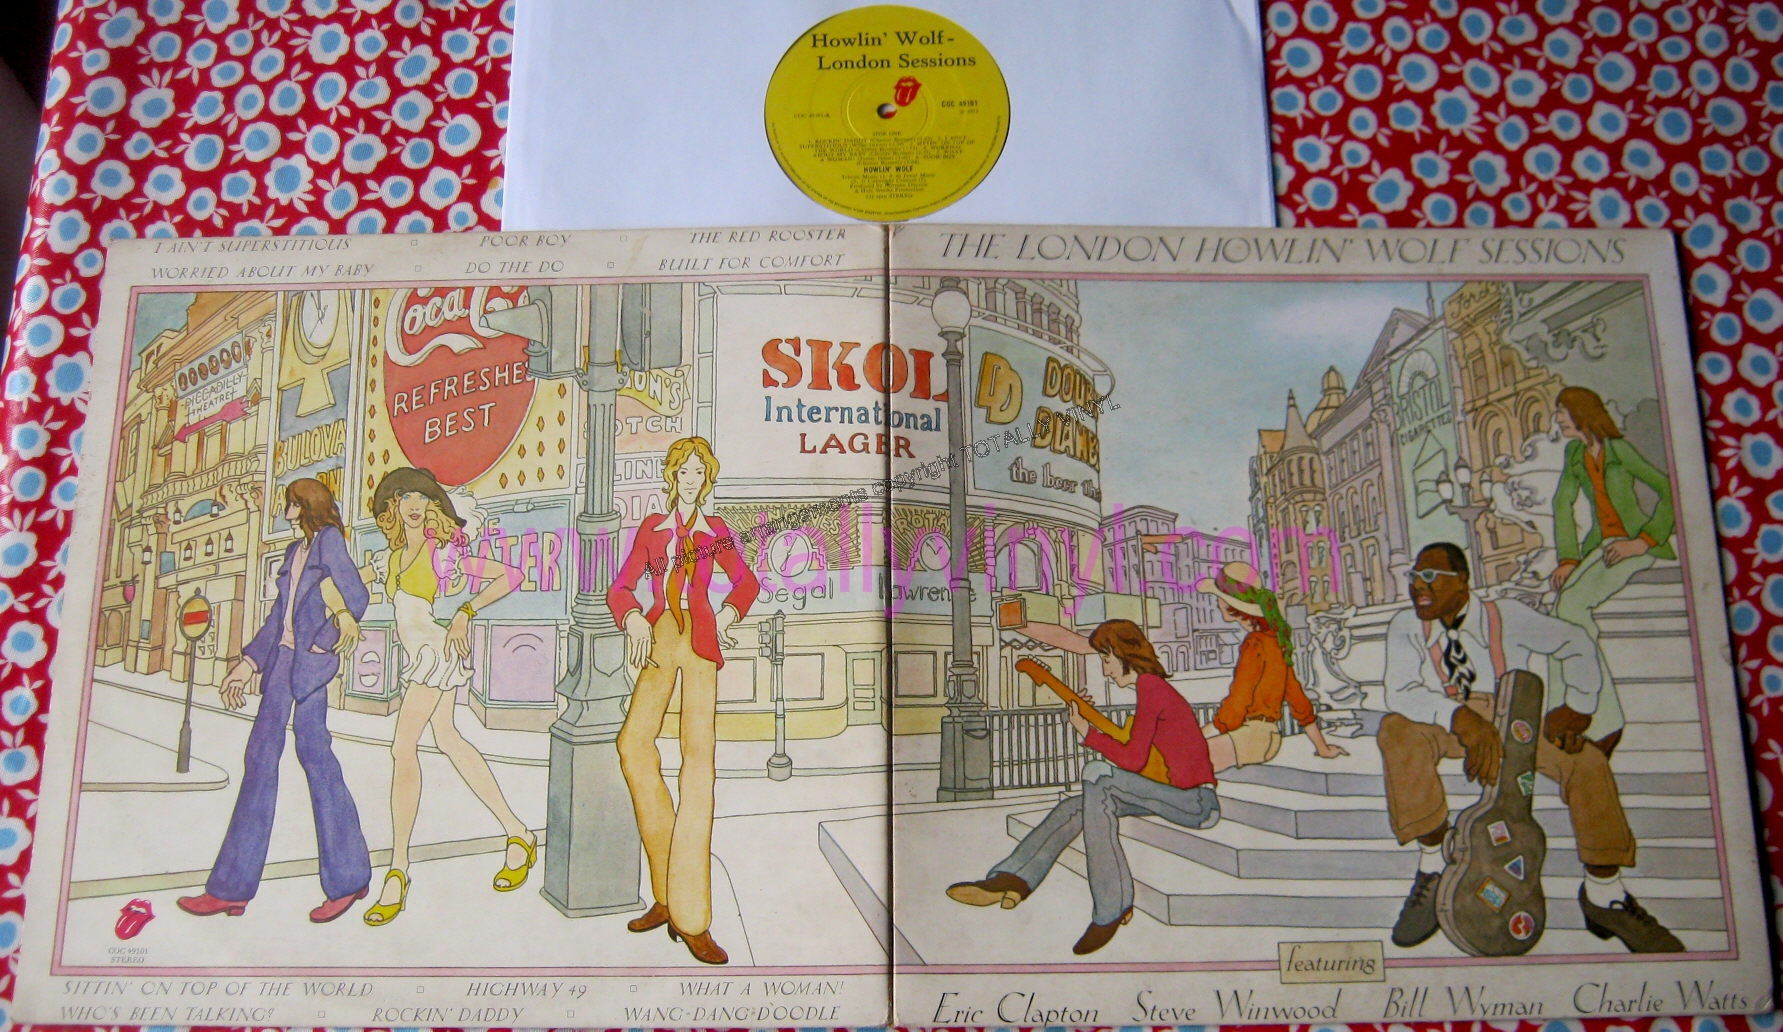 steve winwood roll with it album